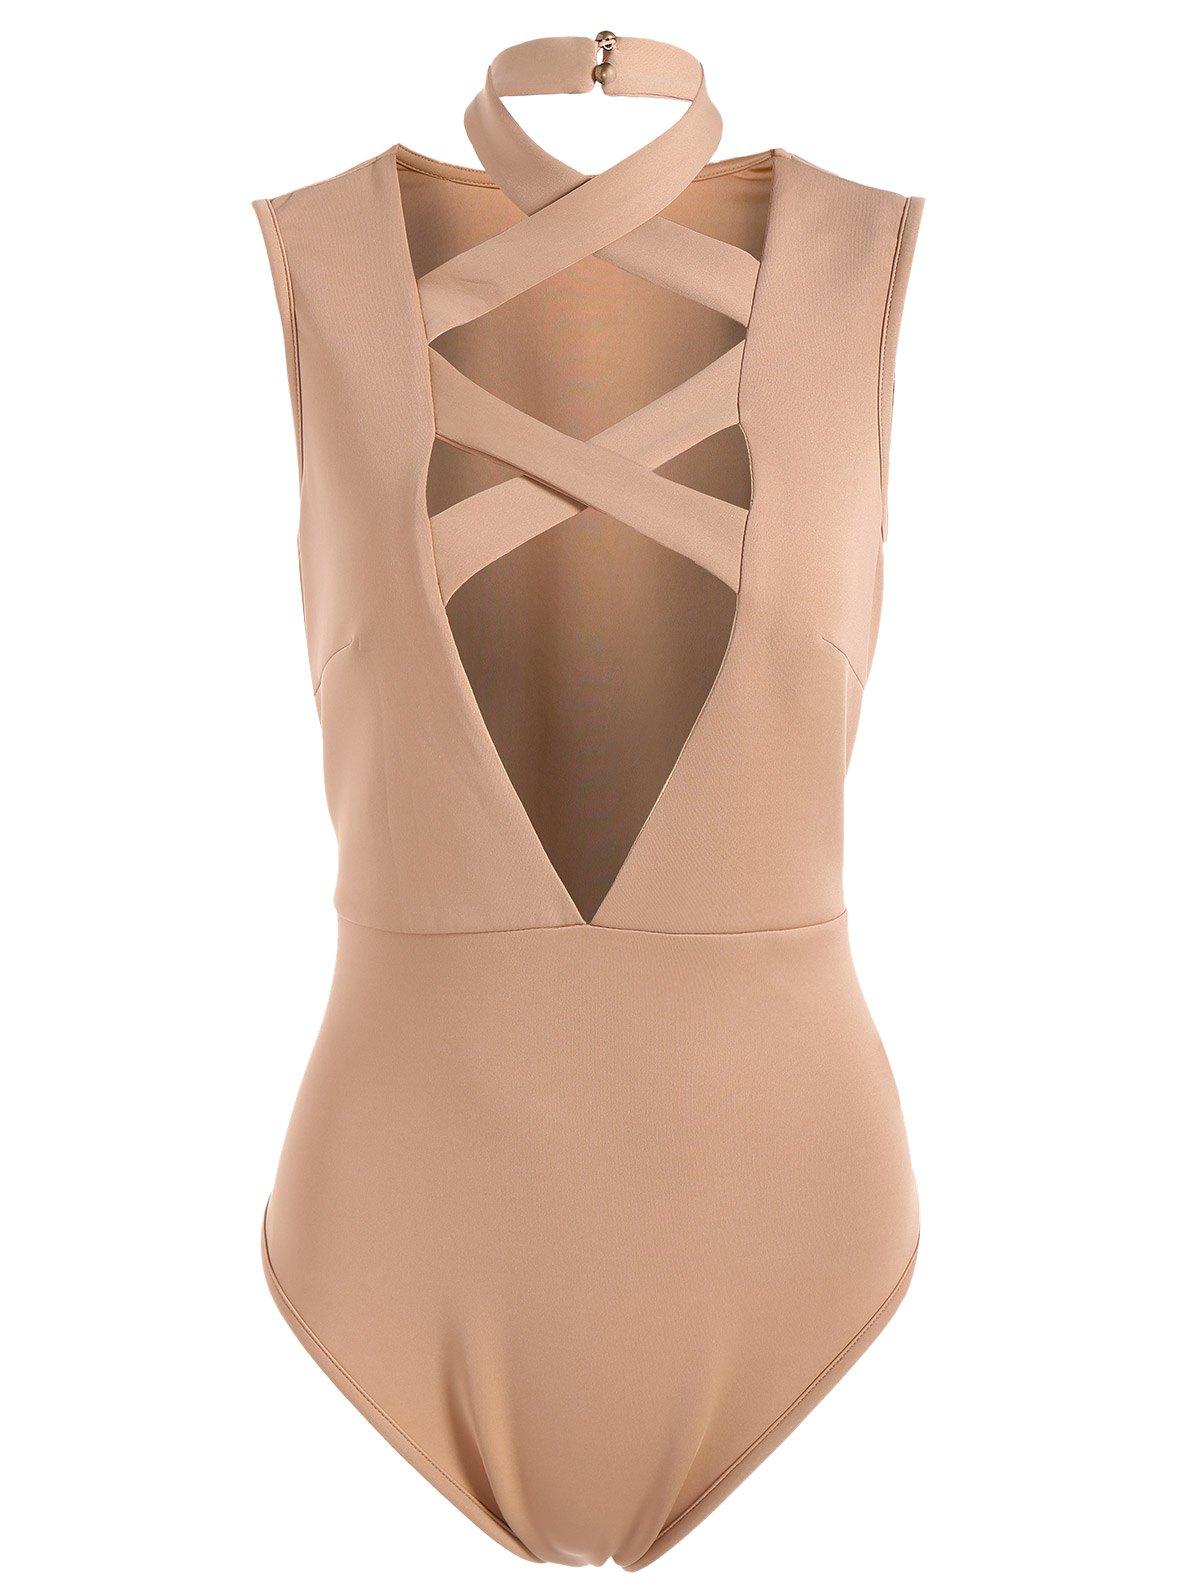 Sleeveless Tight Fit Plunge Bodysuit